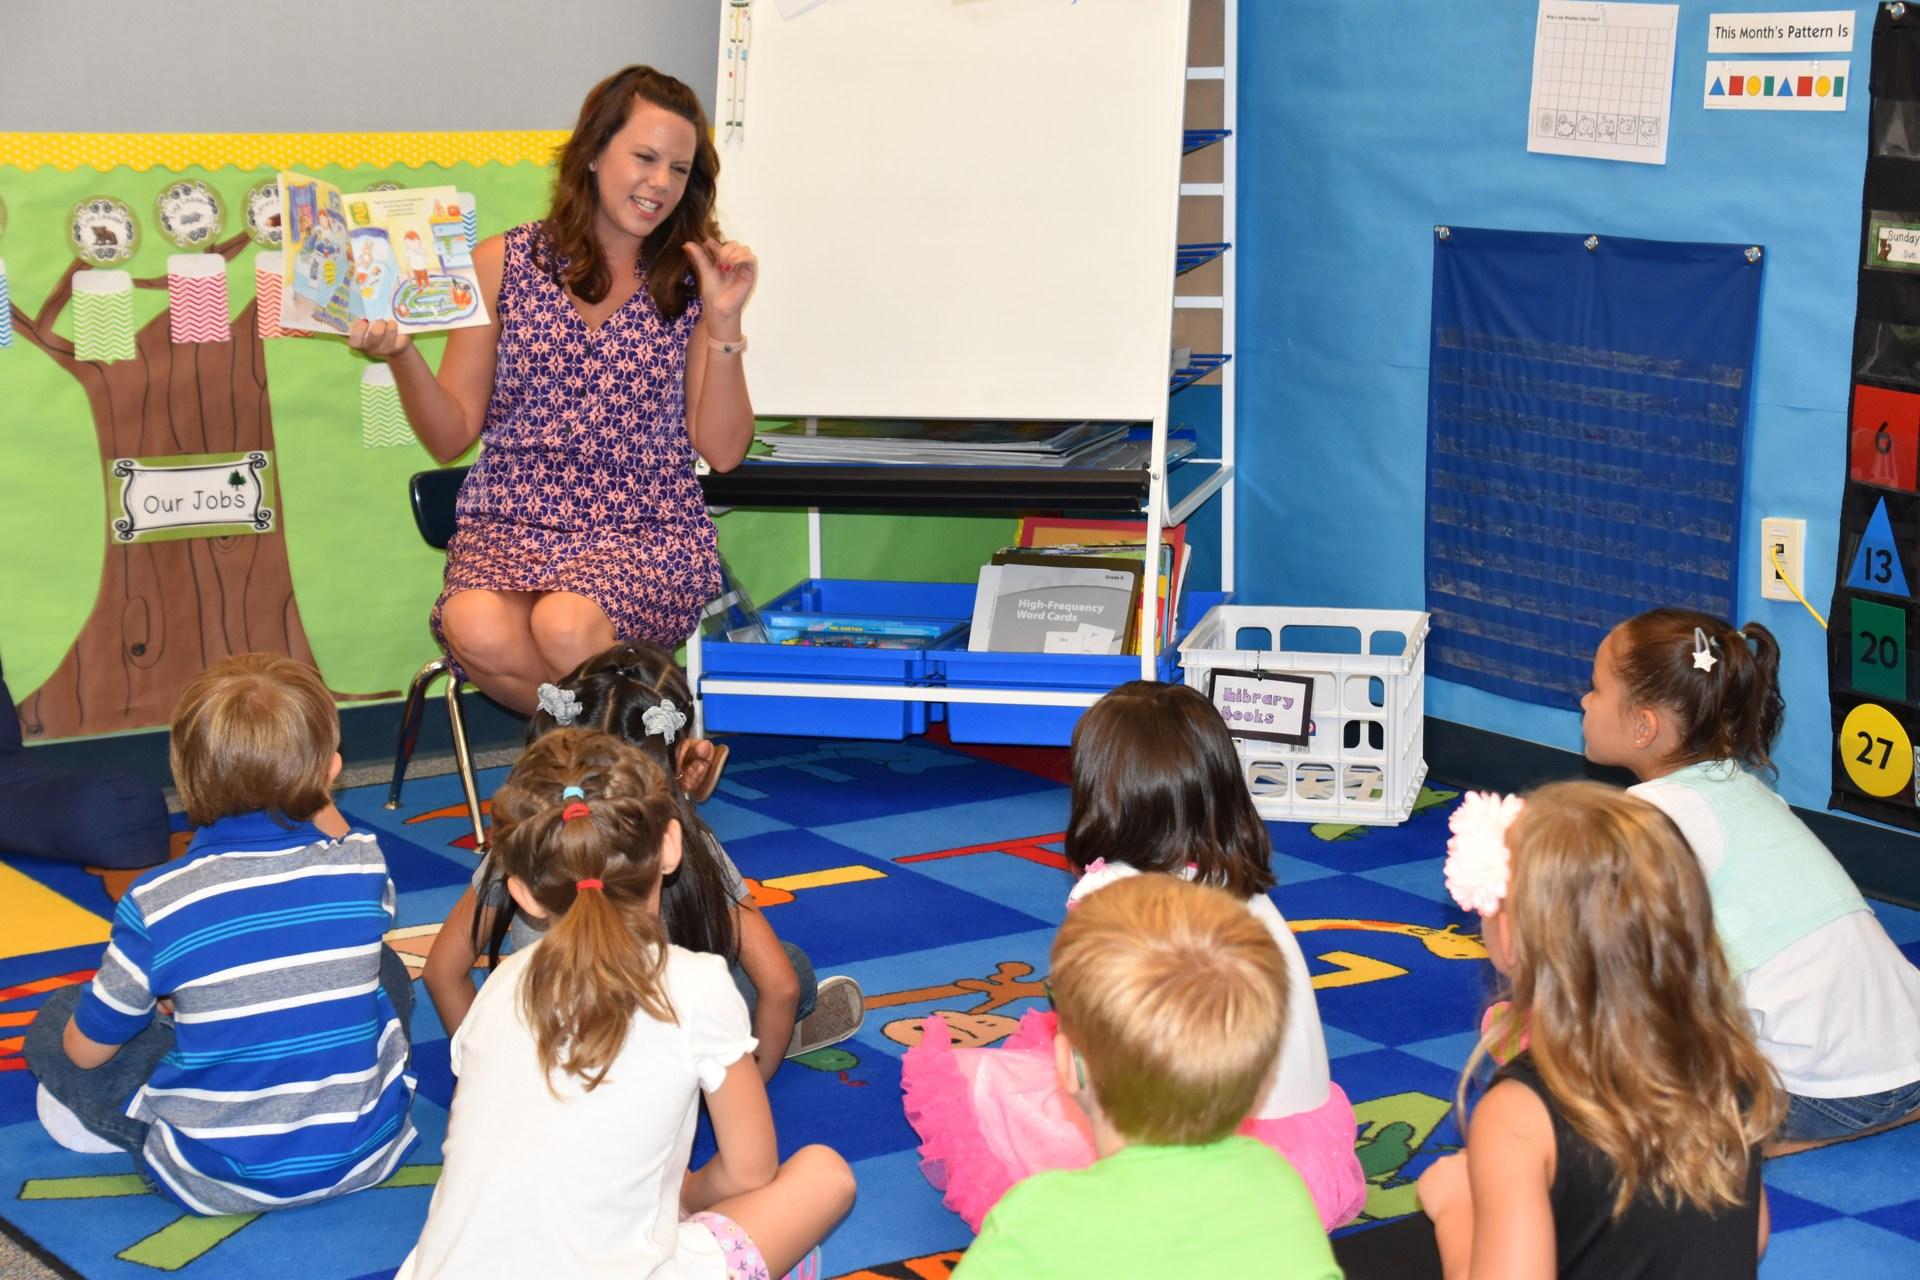 Kindergarten students at orientation reading with teacher